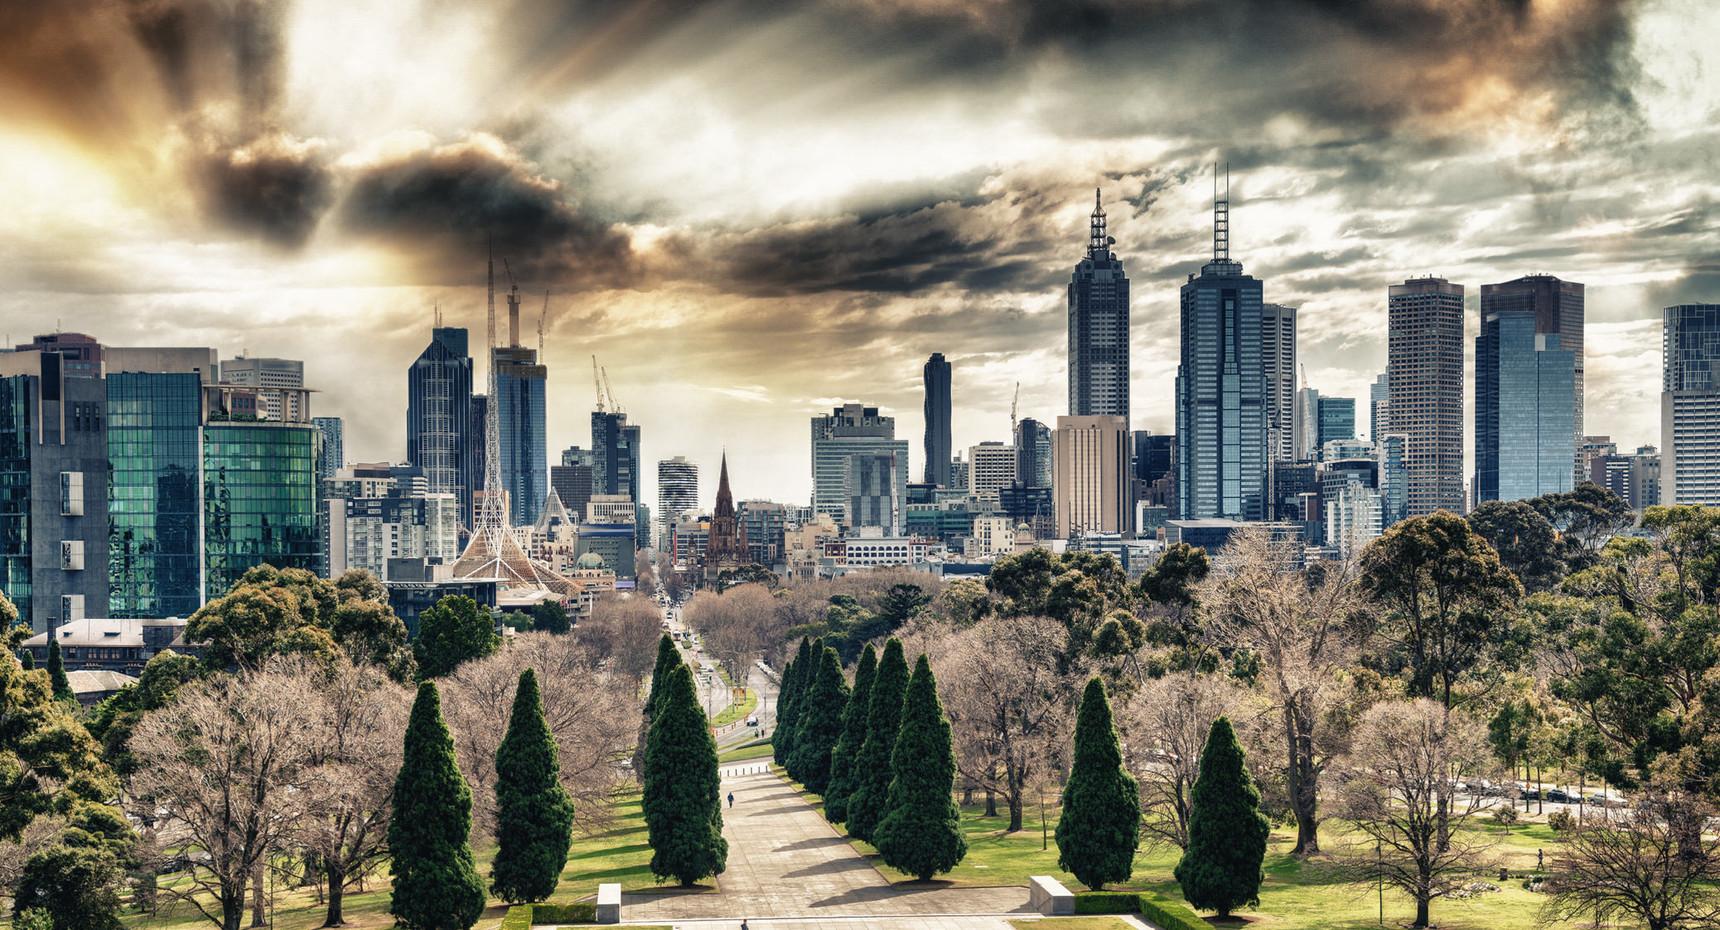 Melbourne skyline at dusk from city park